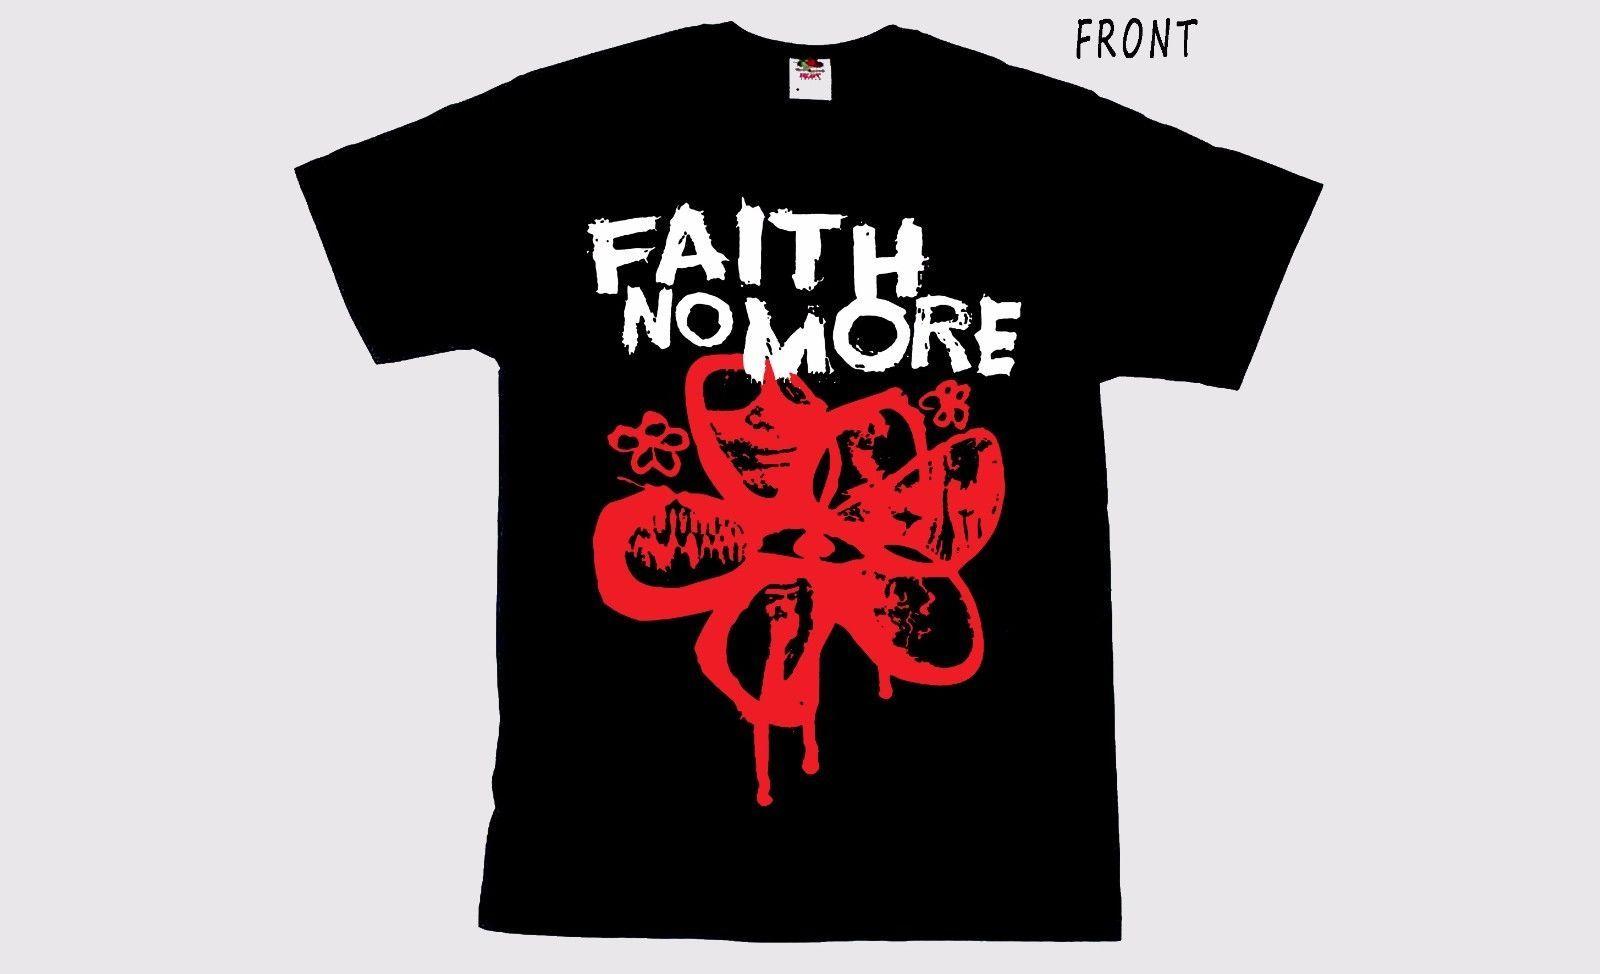 Faith No More - American Rock Band, T-Shirt - Taglie: S To 3xl Printed T Shirt T-shirt da uomo manica corta O-Collo Summer Stree Twear